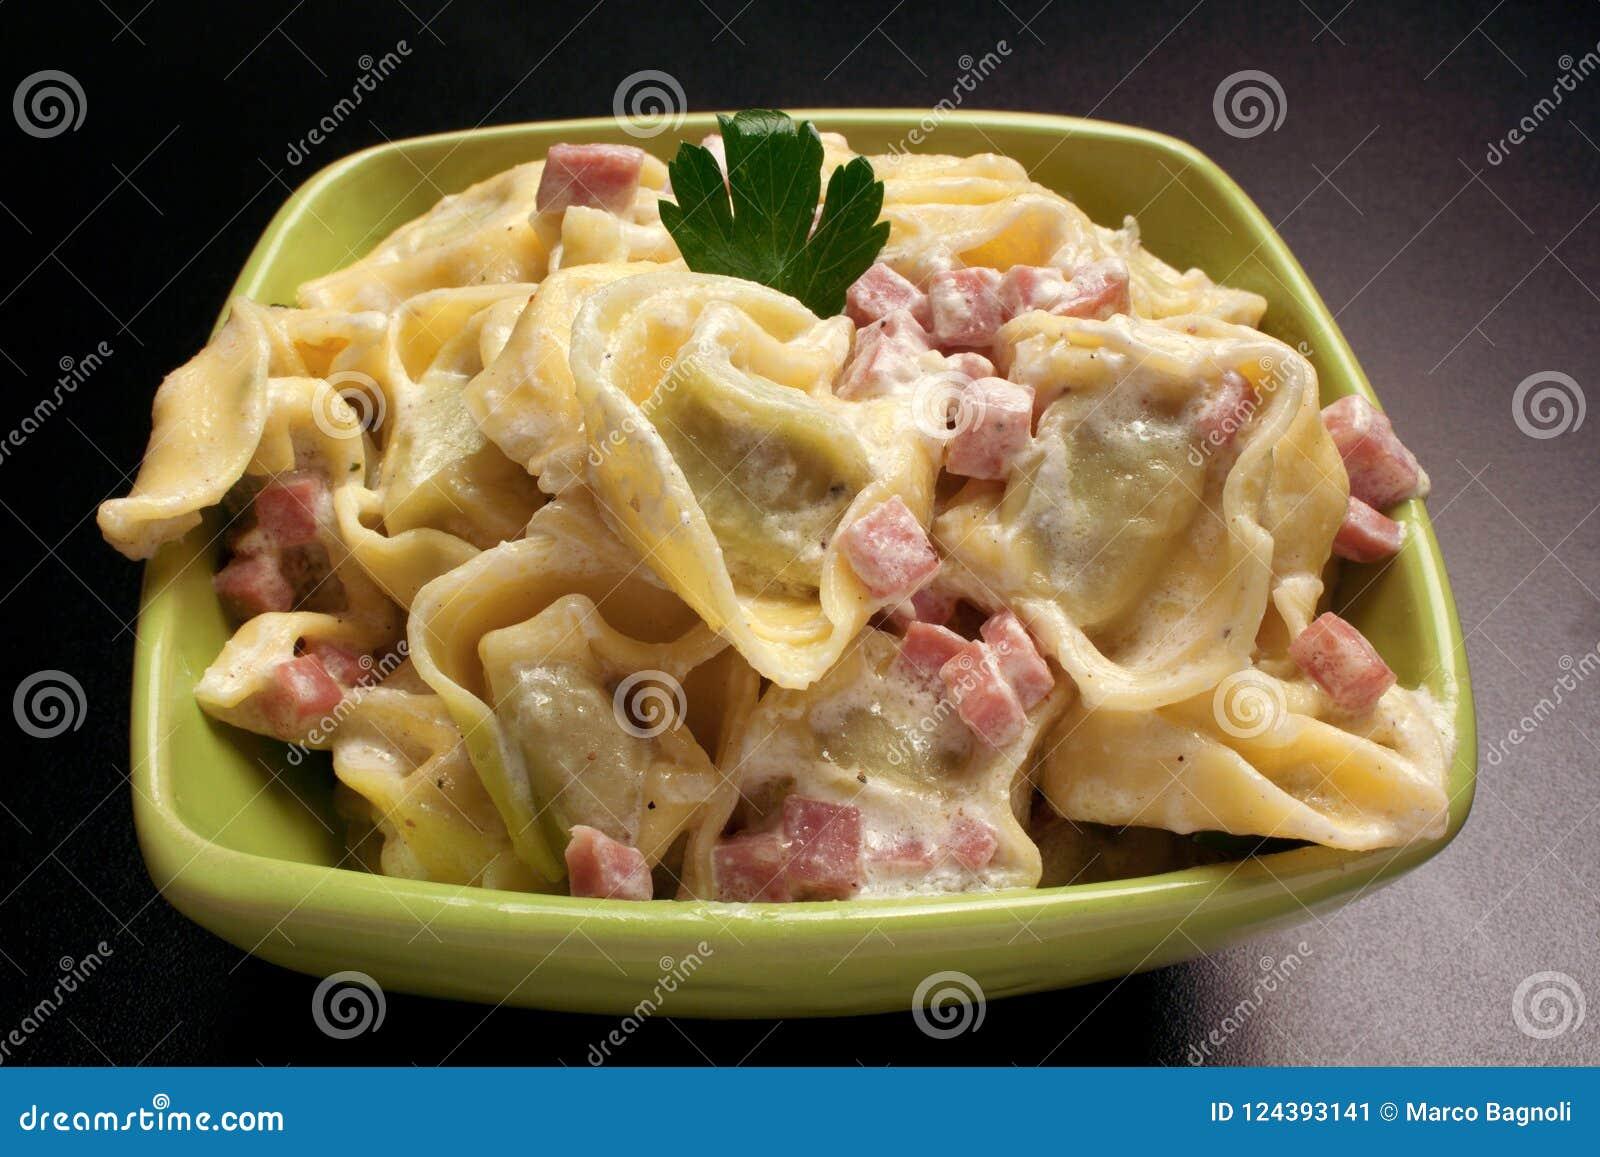 Tortellini With Milk Cream And Ham Stock Image Image Of Pork Cooked 124393141